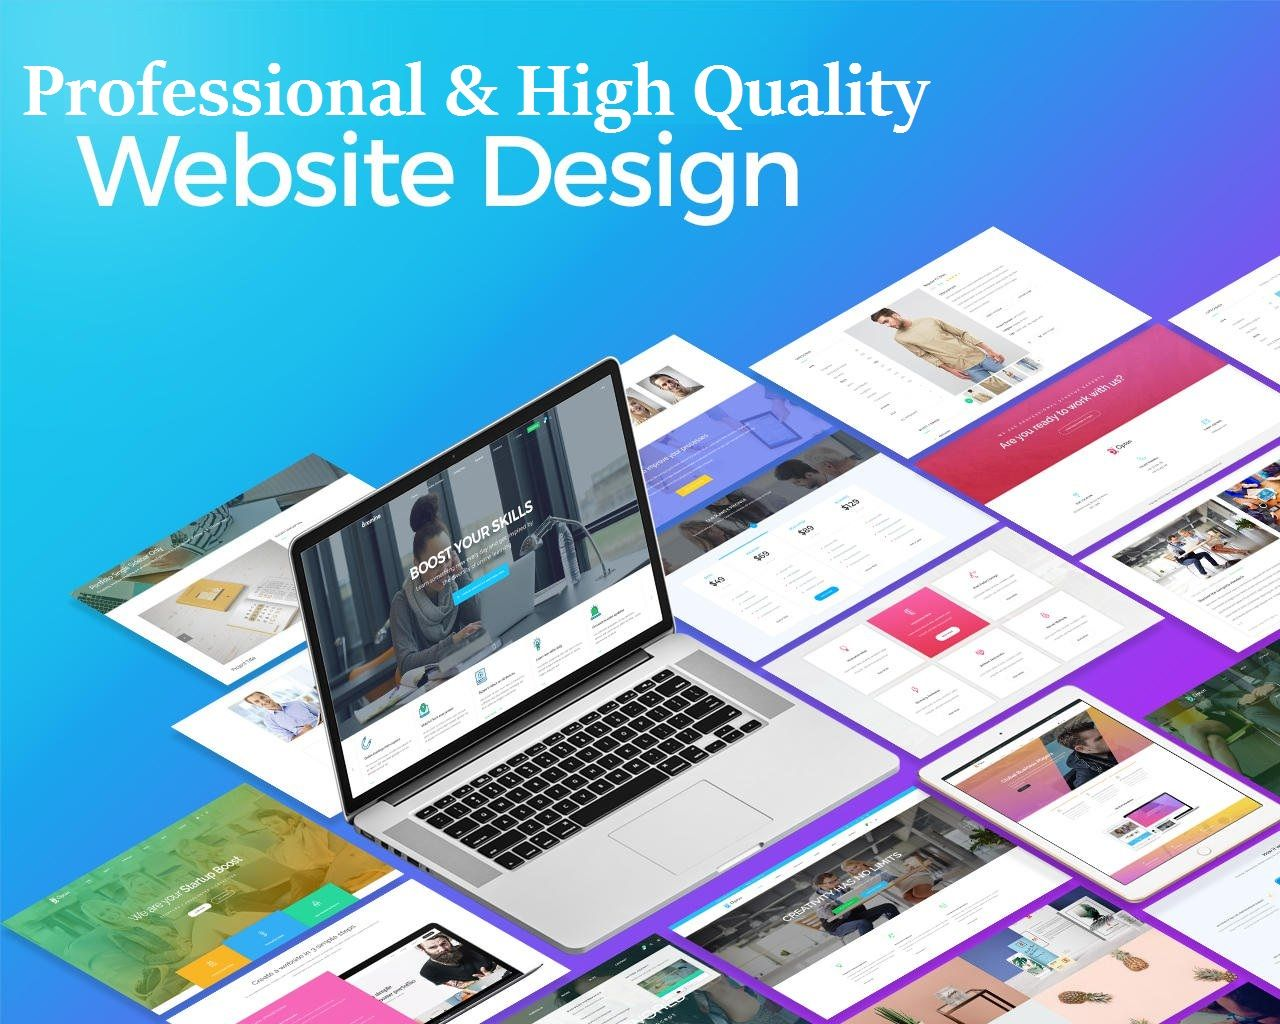 Full Functional Professional Wordpress Website Setup Website Design Services Web Development Design Wordpress Website Design